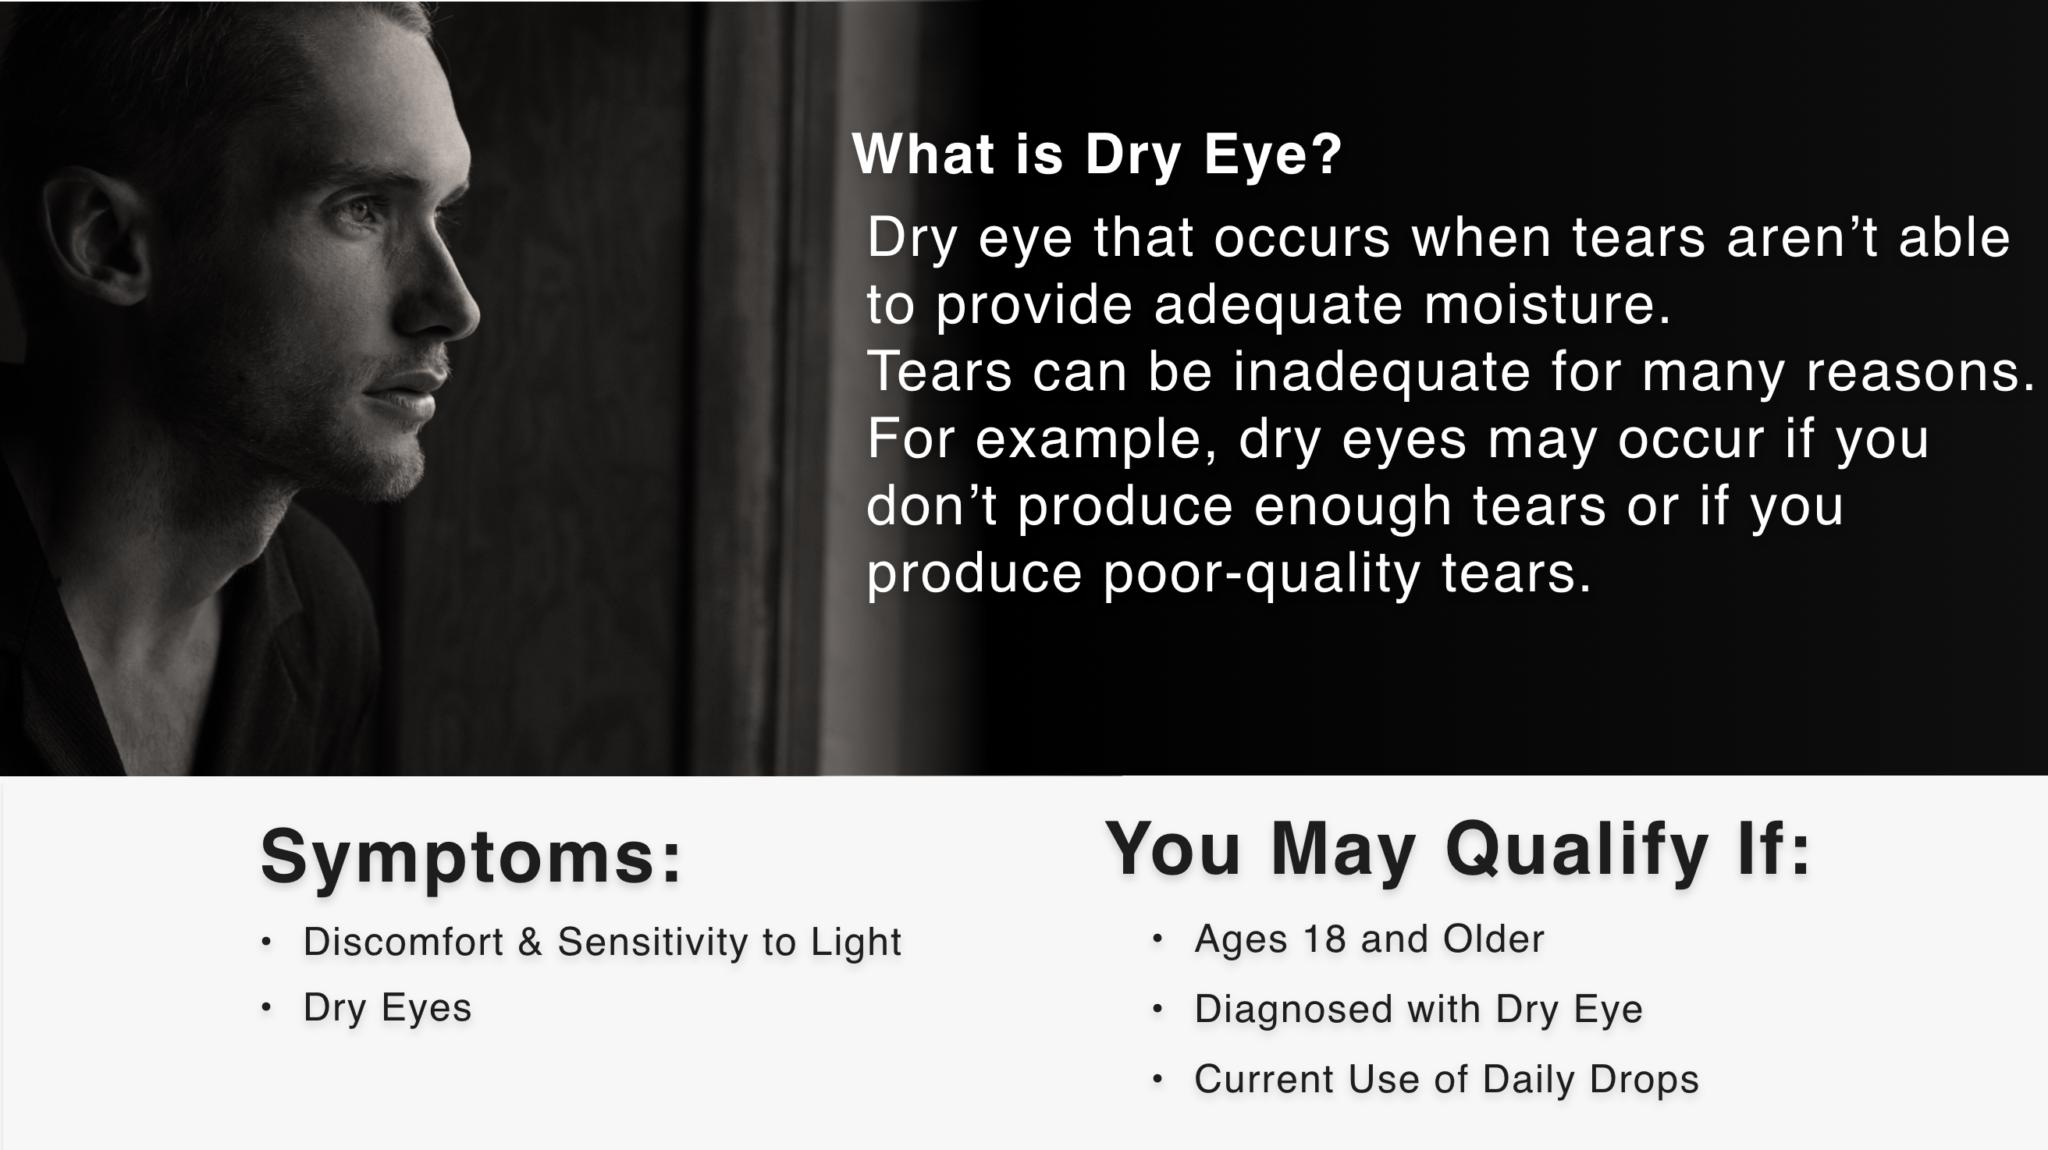 dry-eye-landing-page-info